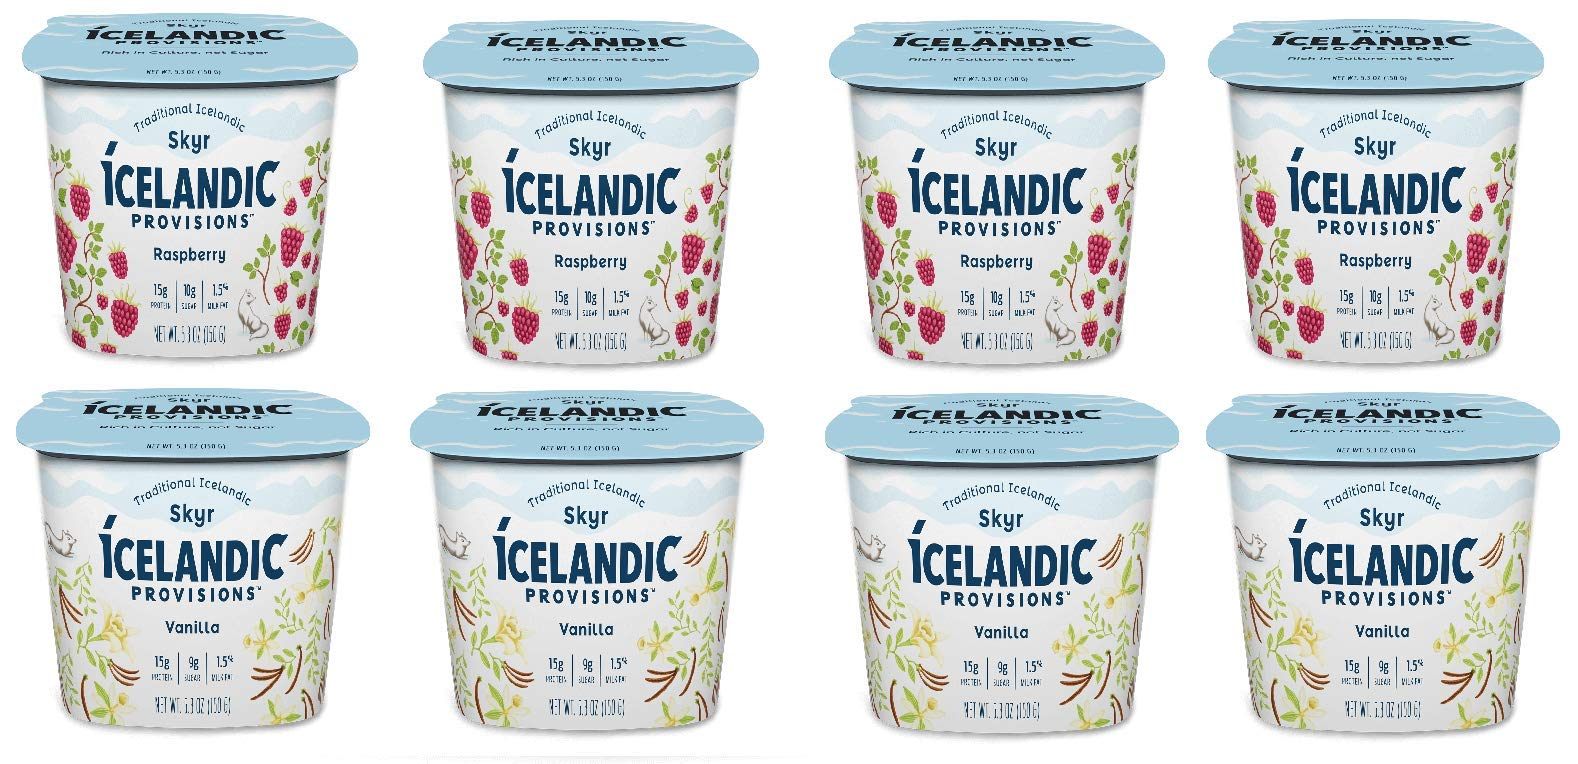 Icelandic Provisions, Skyr Yogurt, Vanilla, Raspberry (Pack of 8)